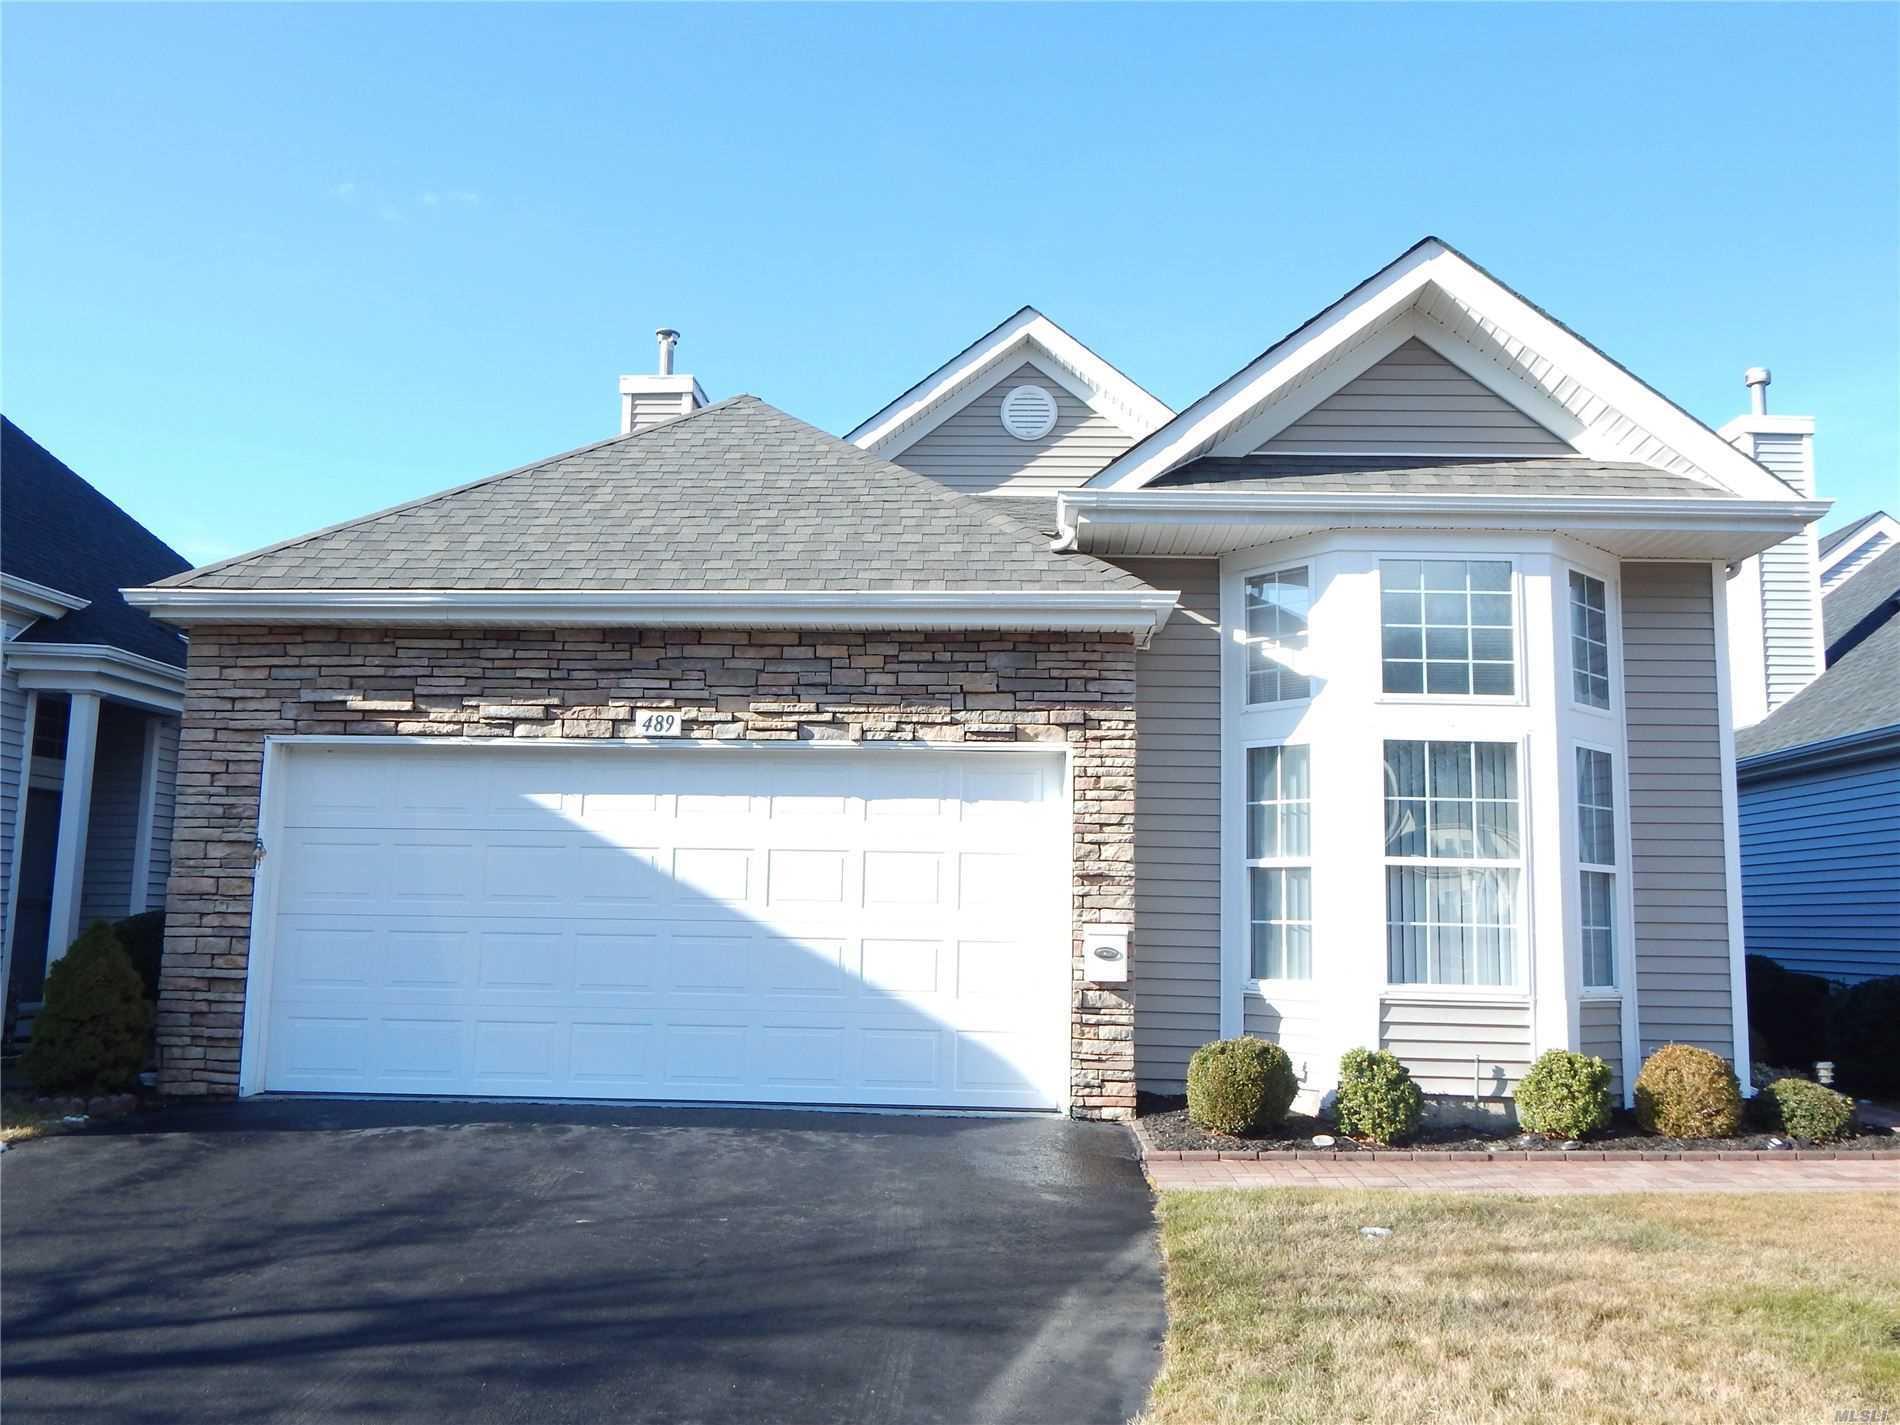 Property for sale at 489 Leisure Drive # 489, Ridge NY 11961, Ridge,  New York 11961